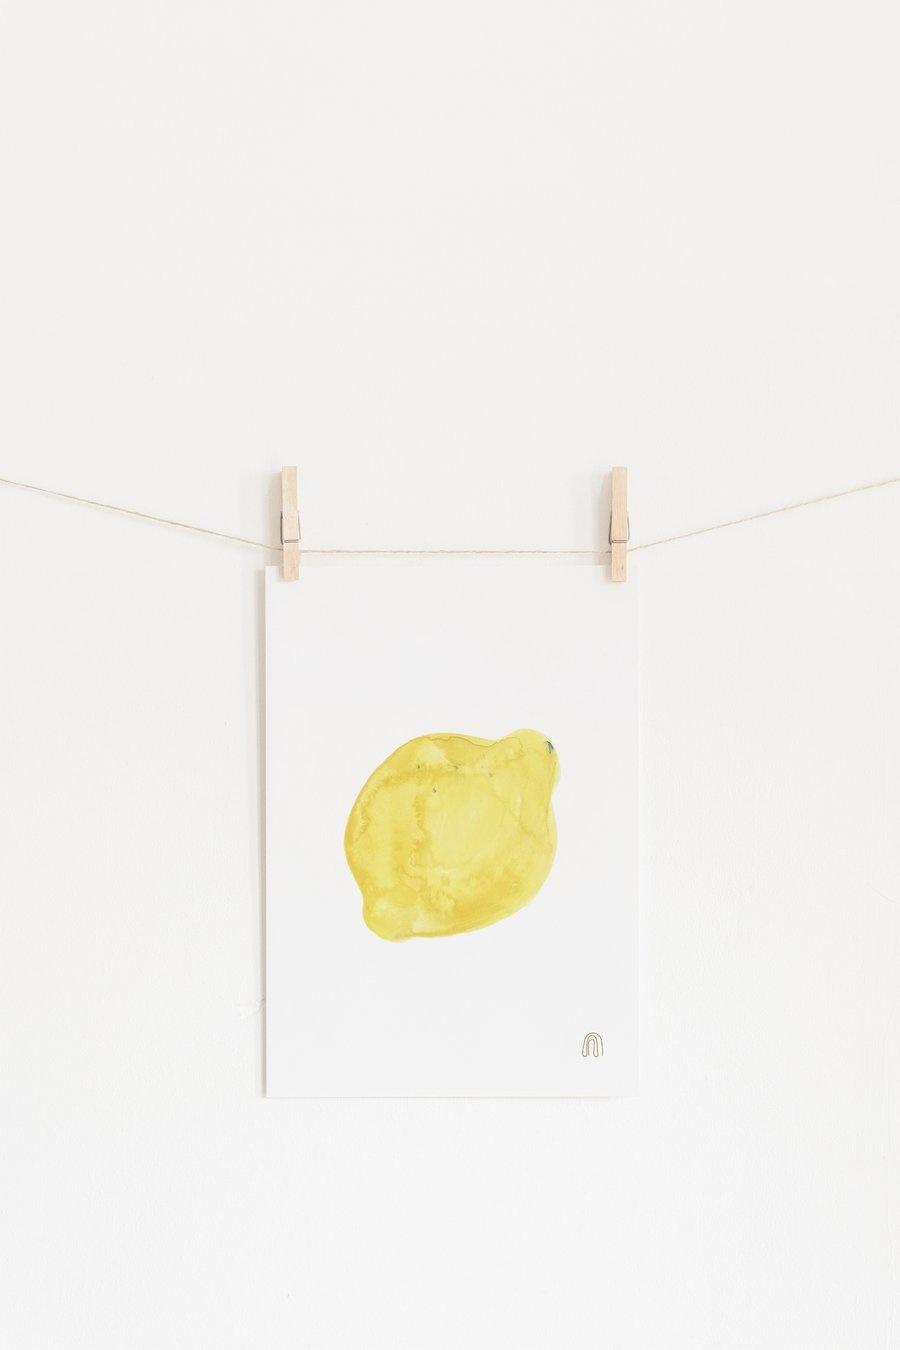 Citron Art poster